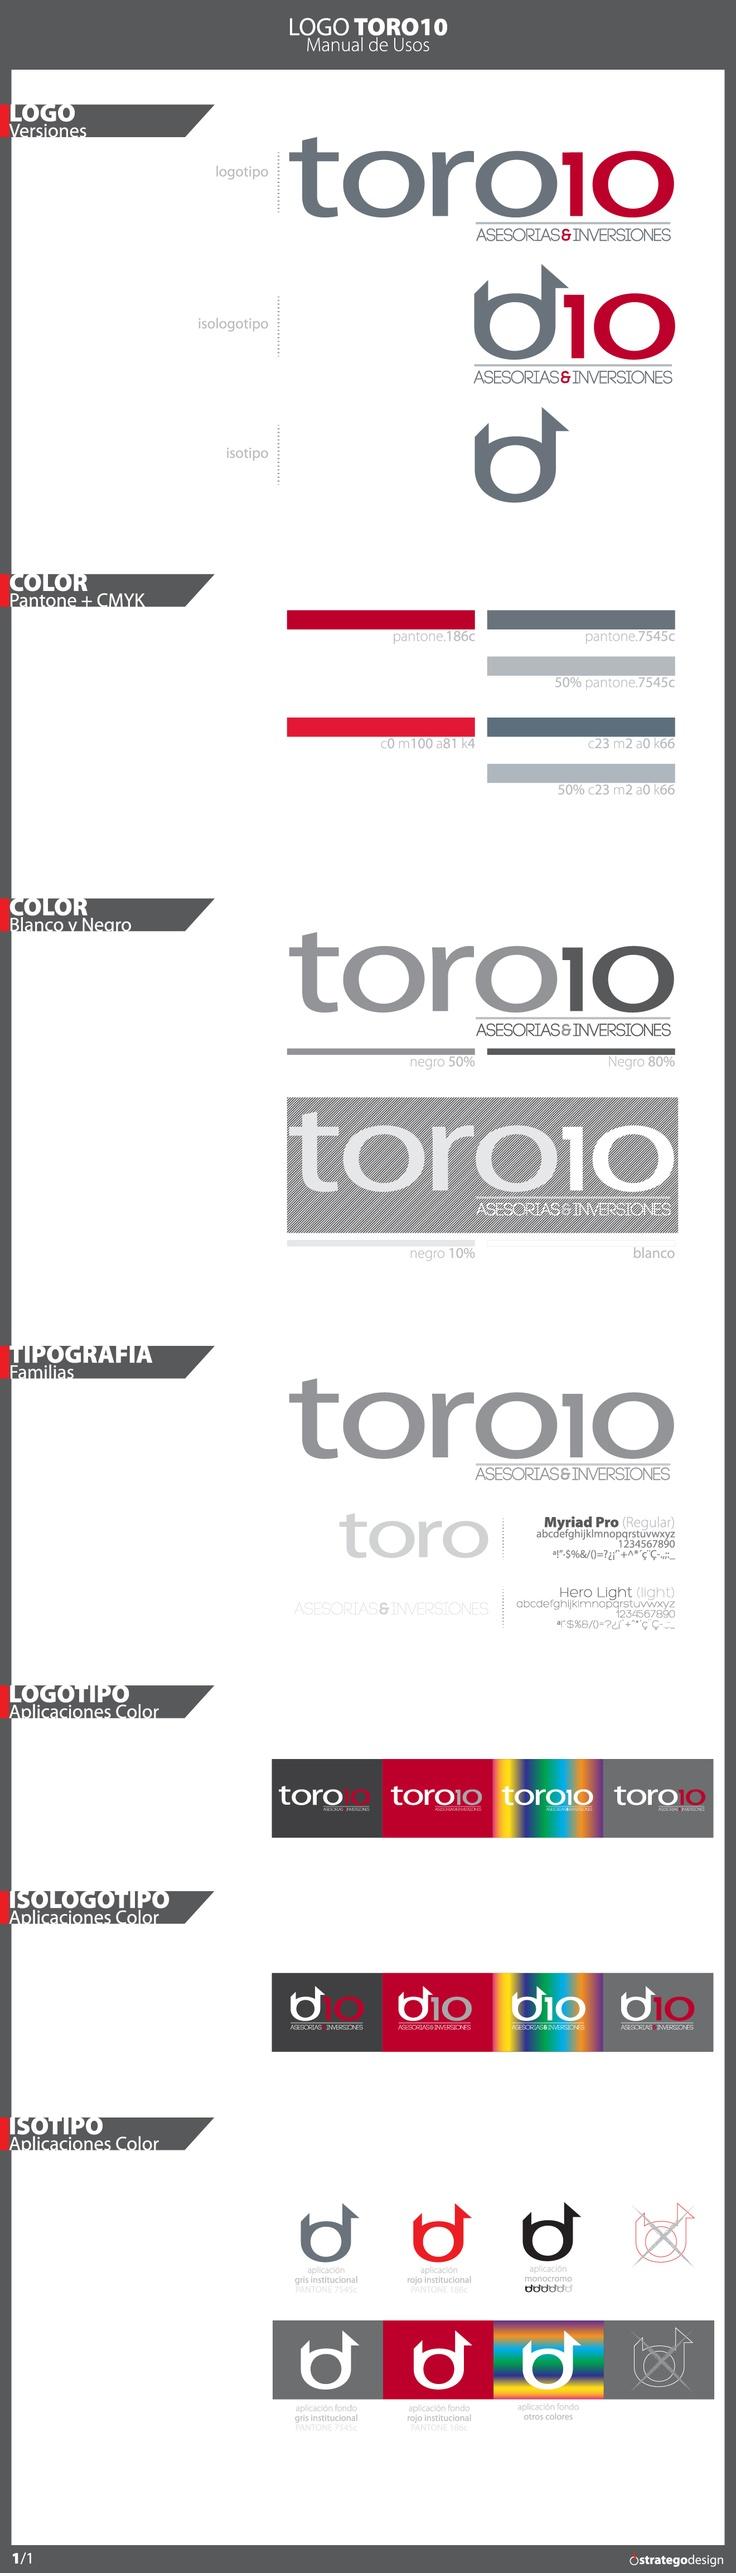 Desarrollo Imagen Corporativa  TORO10